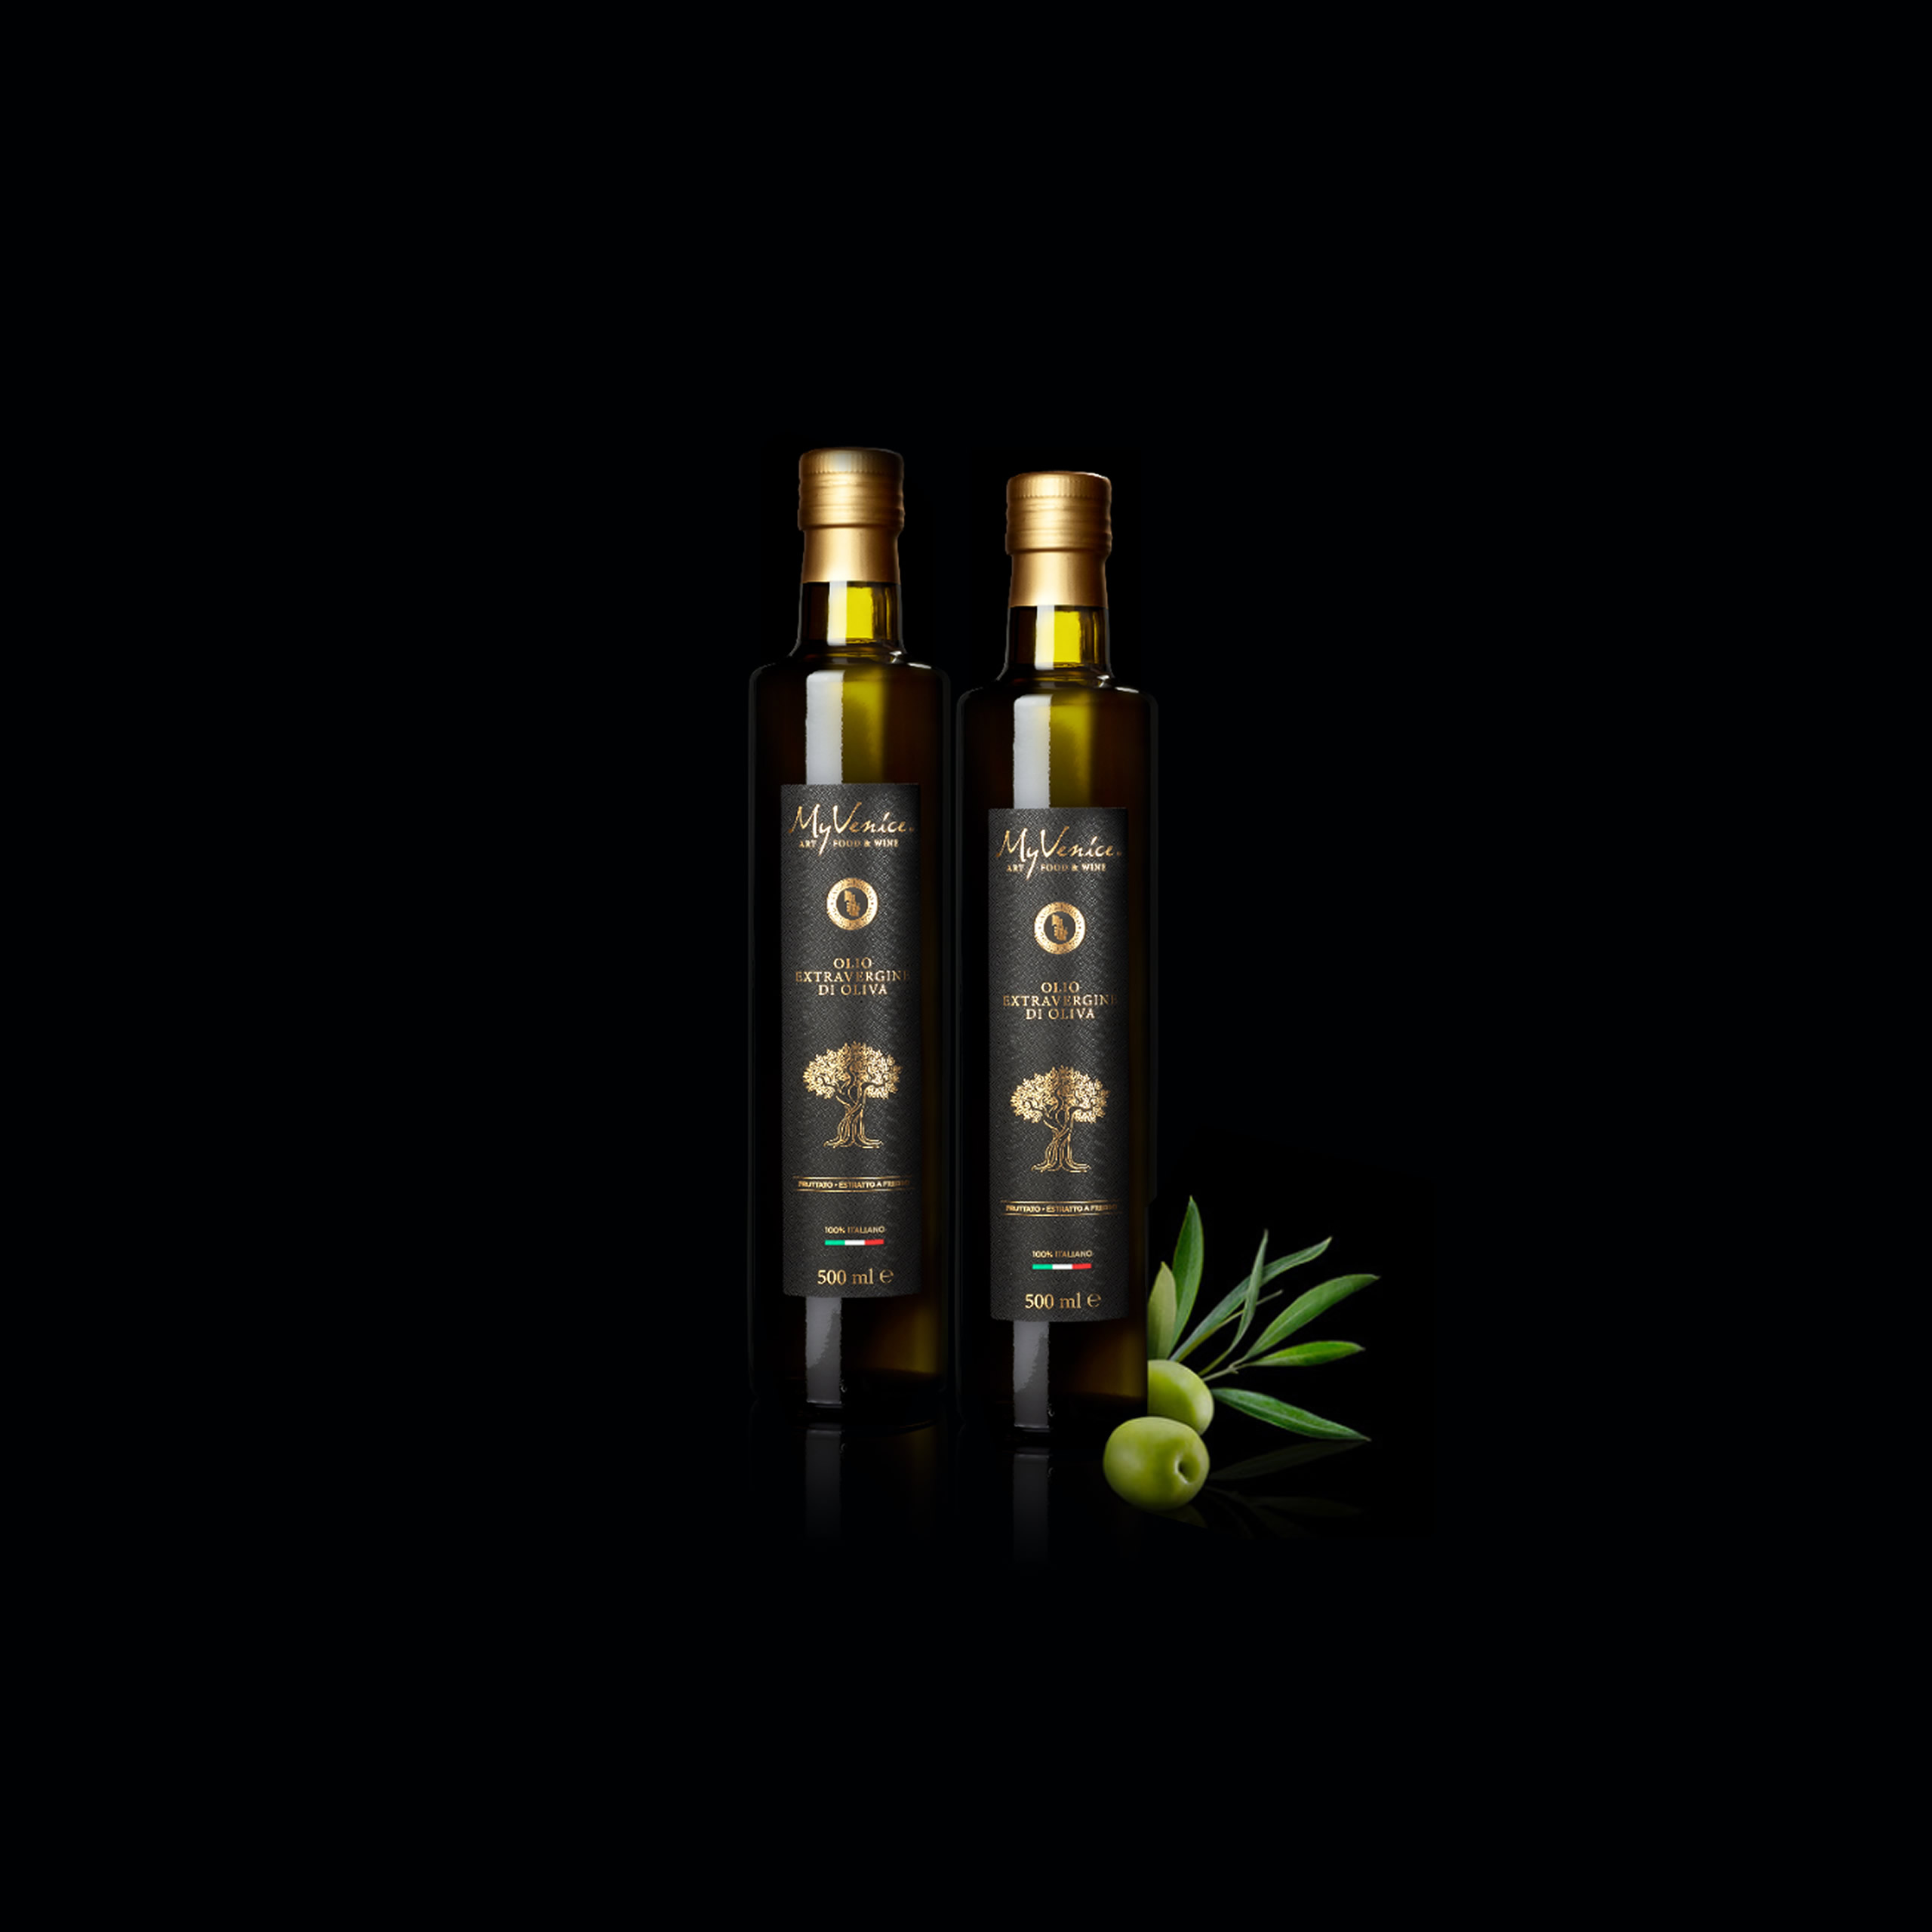 My Venice - extra virgin olive oil